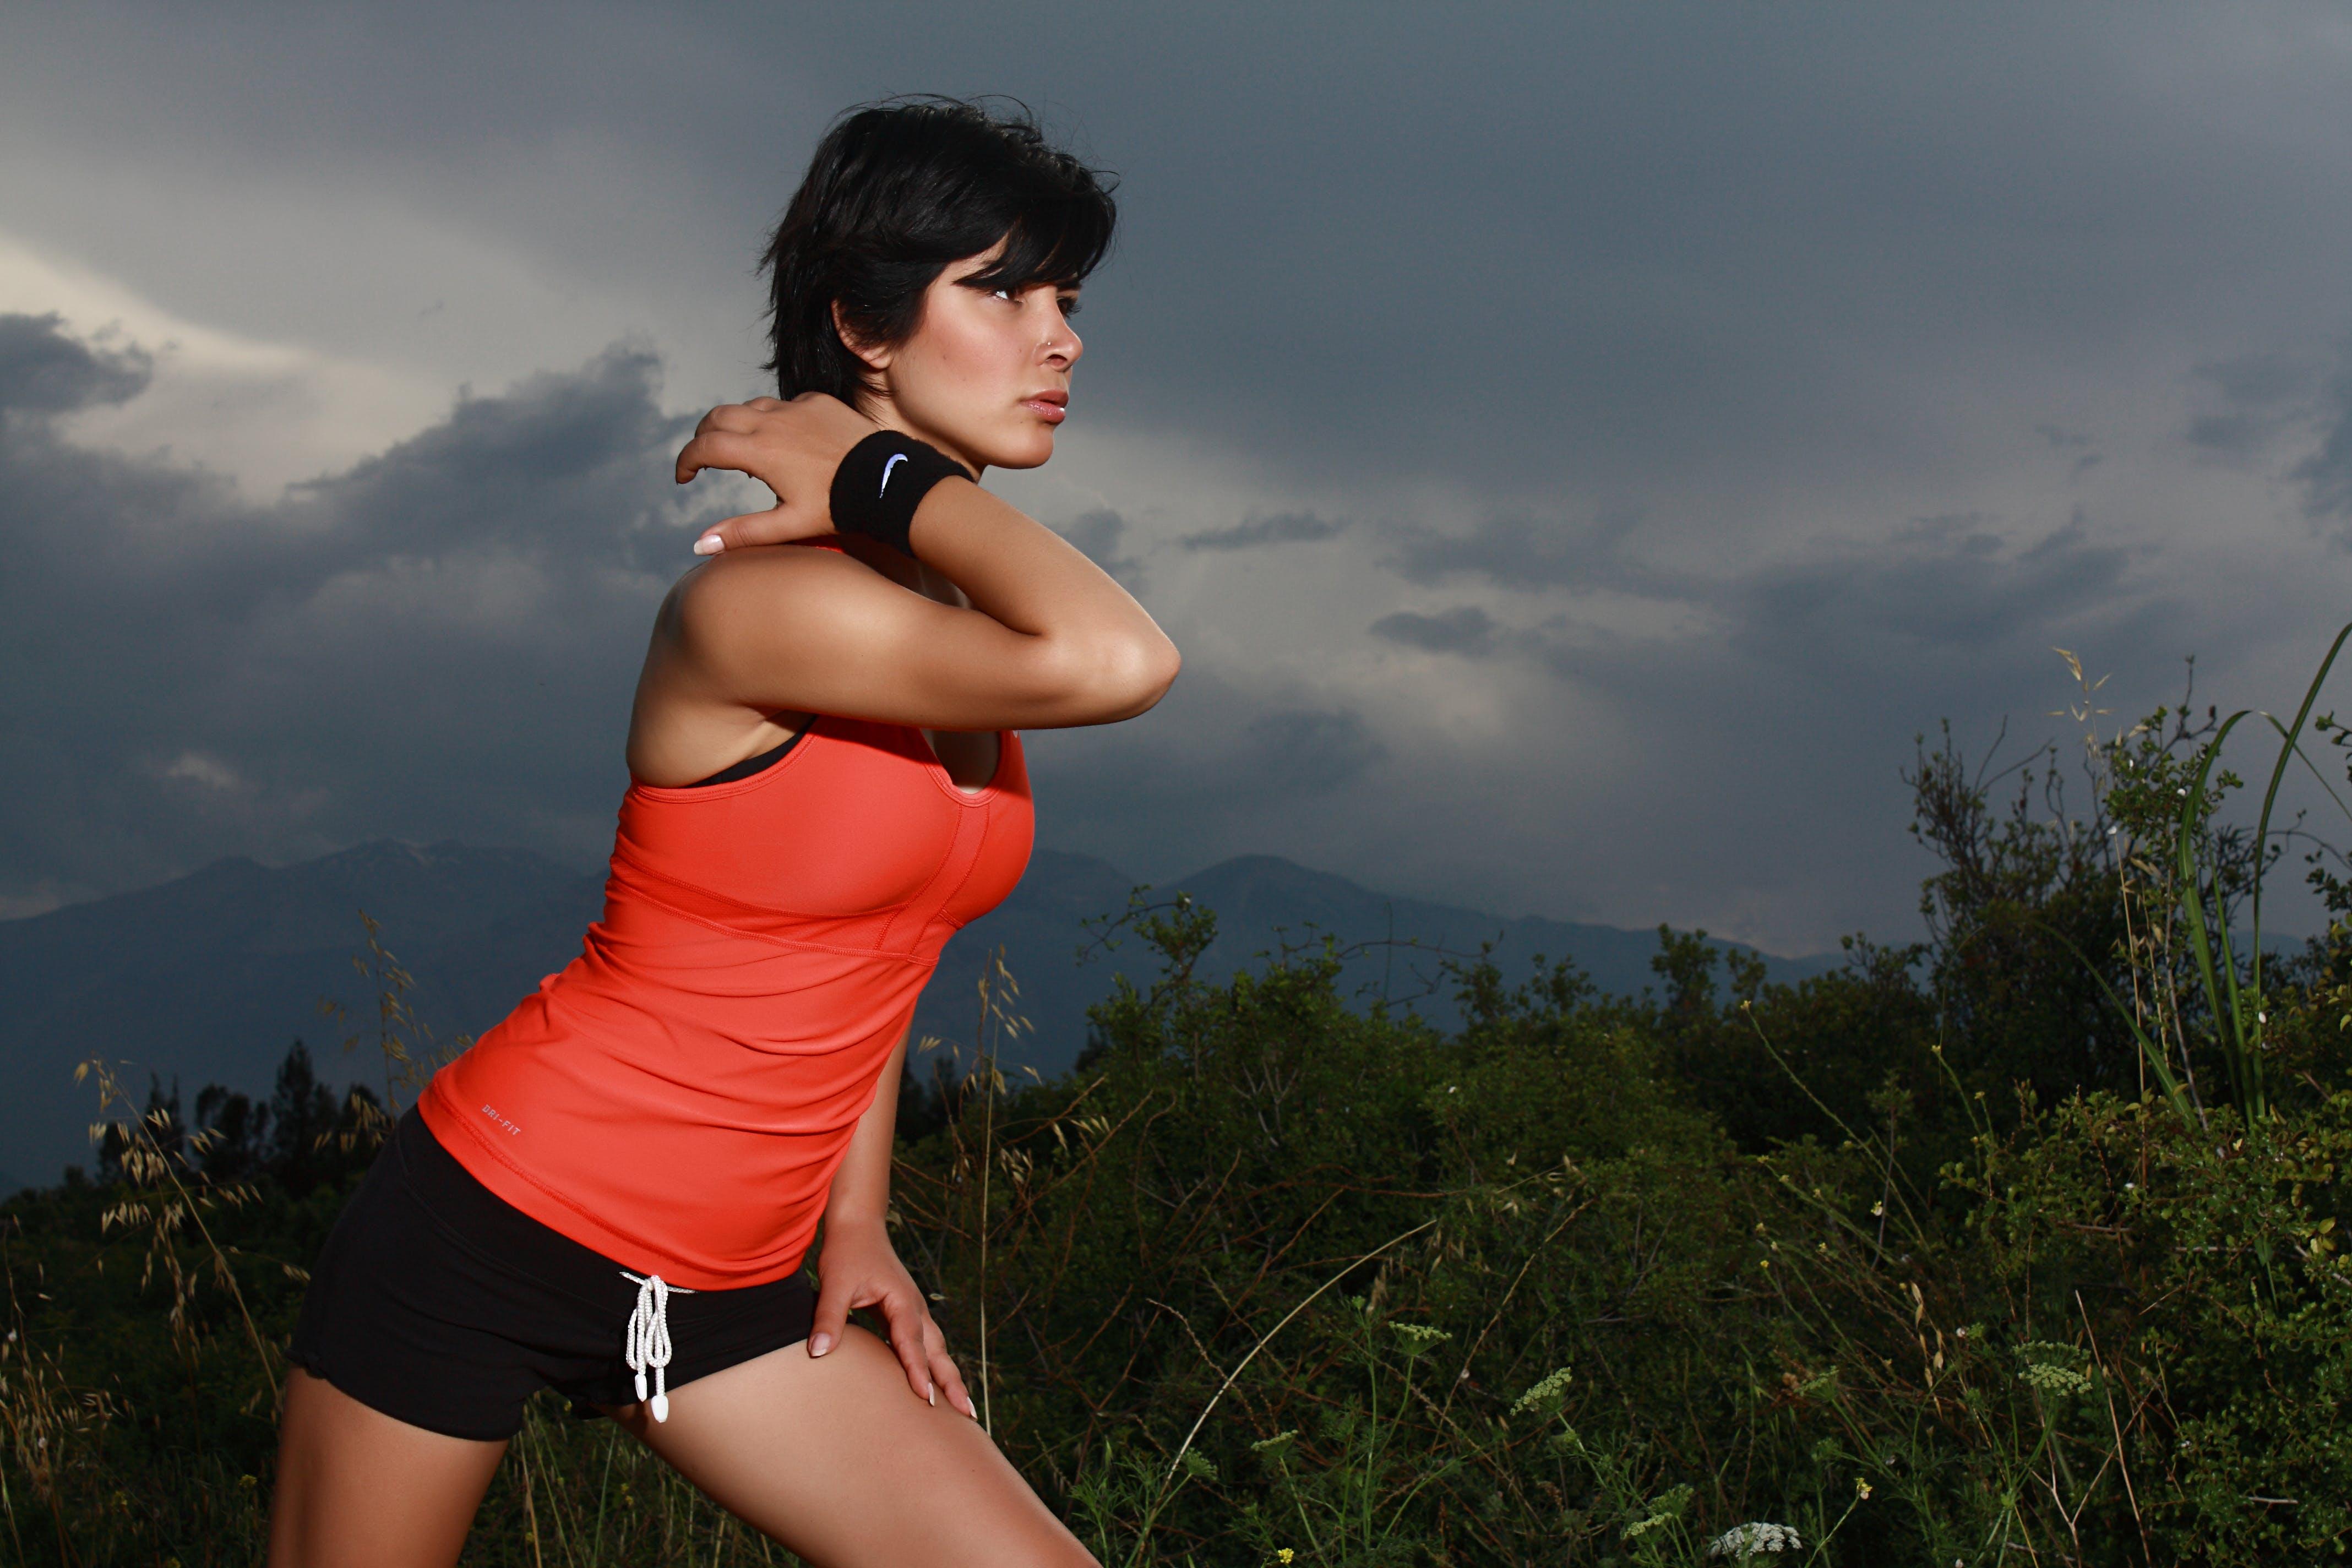 Woman Stretching Her Body Beside Green Grass